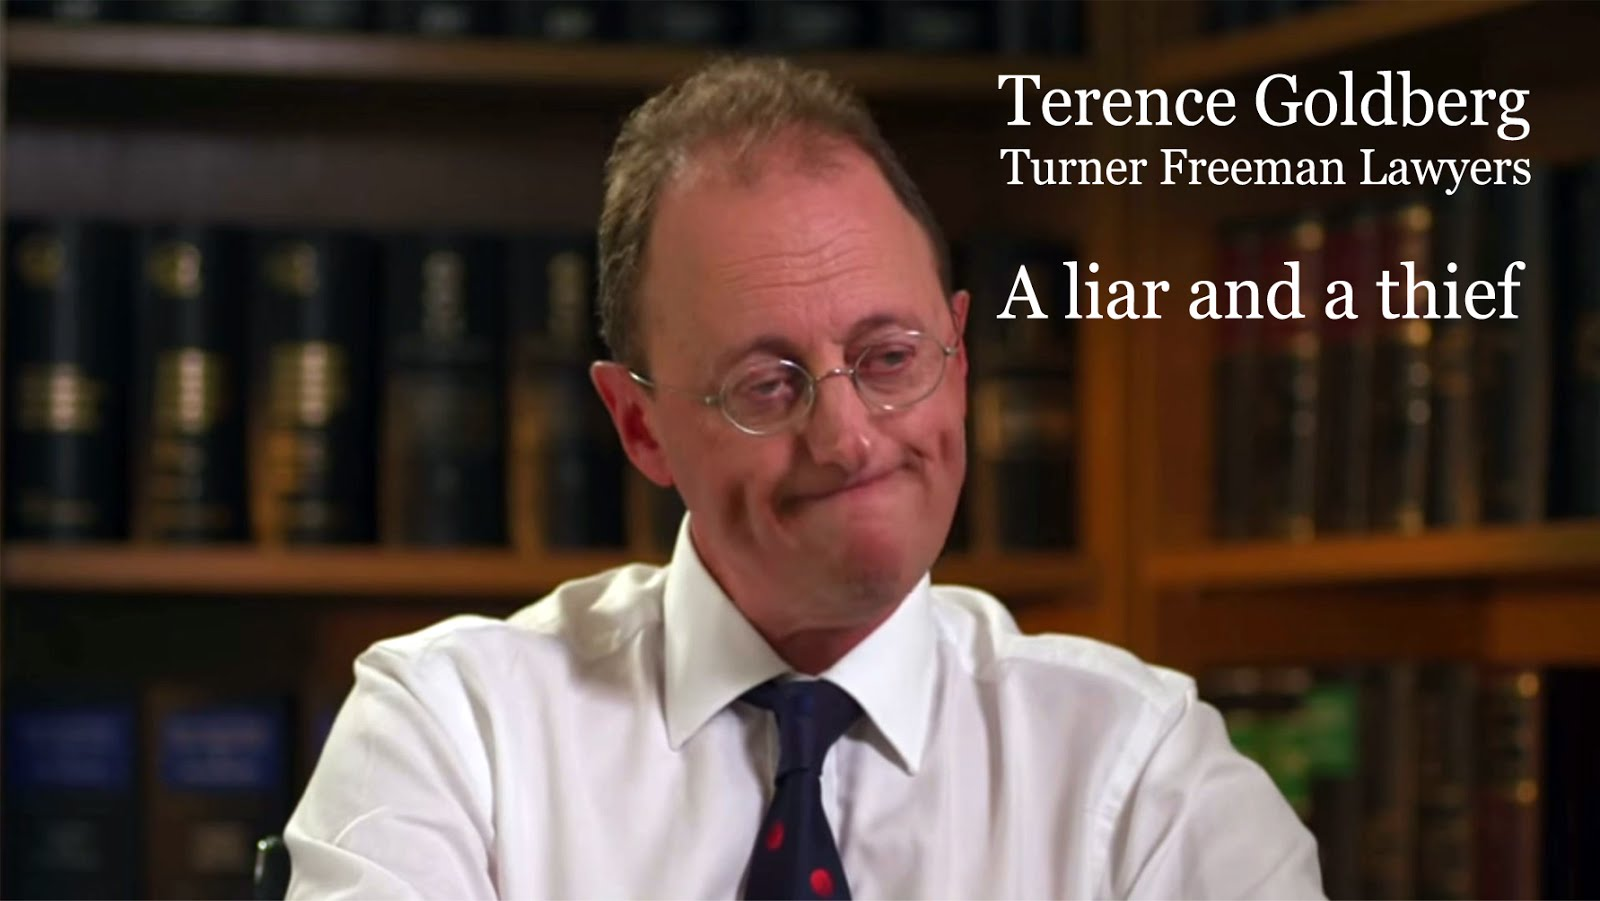 Terry Goldberg, Turner Freeman Lawyers